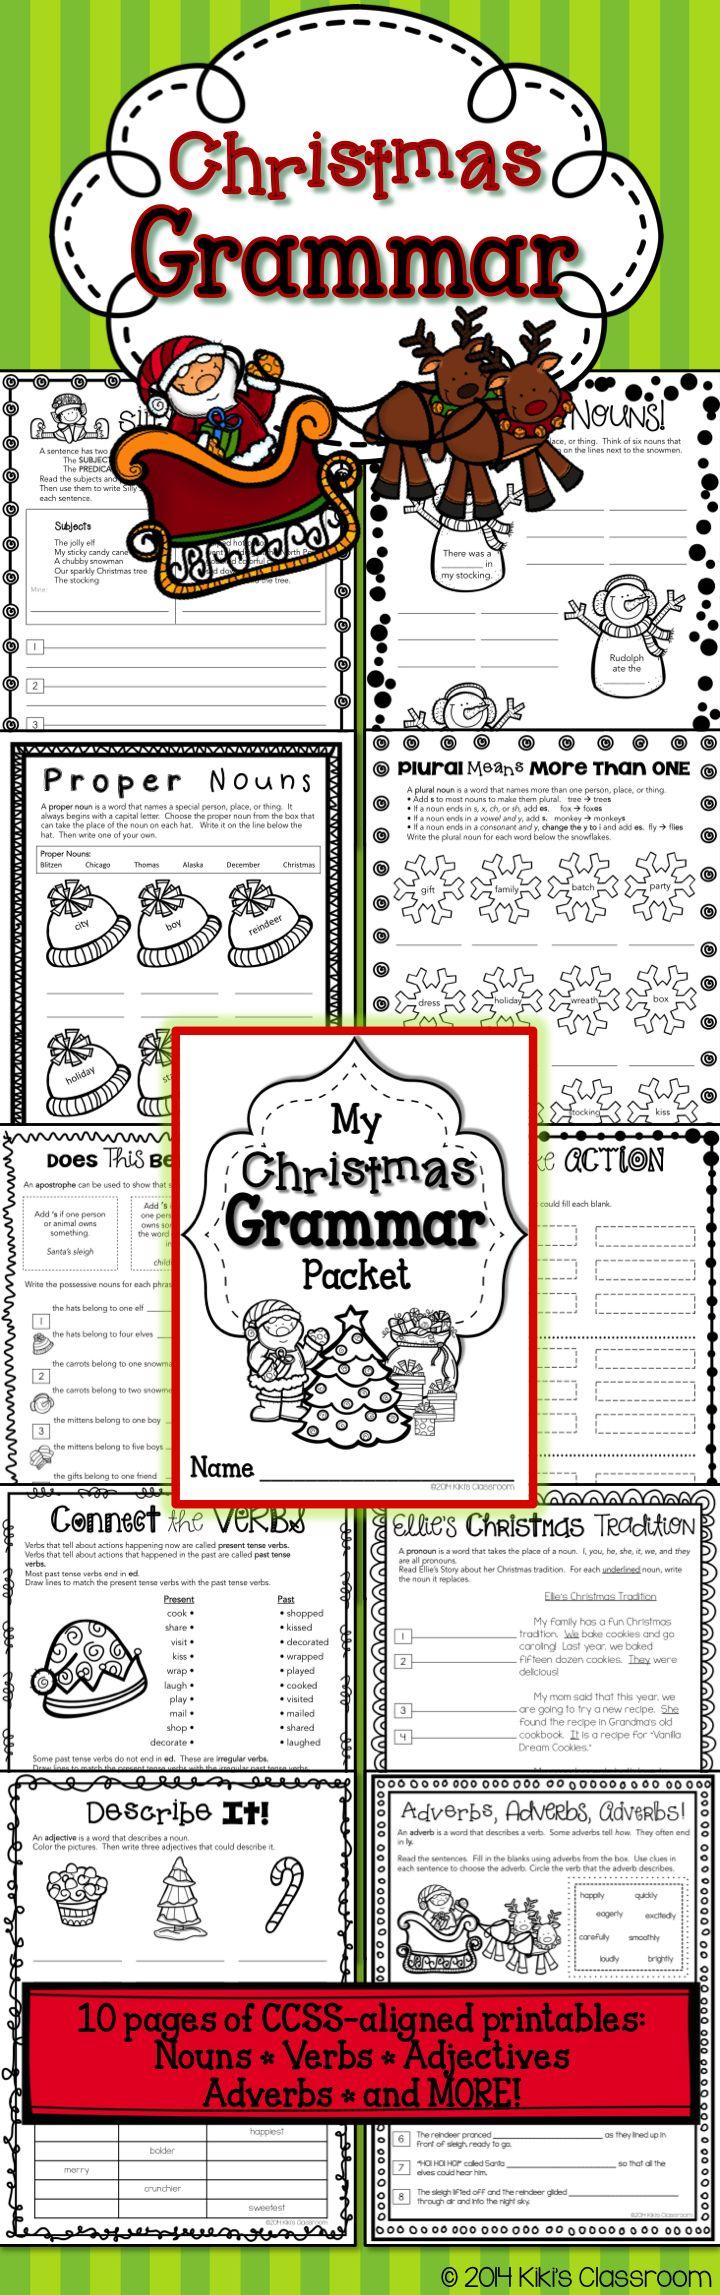 best 25 adverbs ideas on pinterest grammar anchor charts noun chart and alliteration def. Black Bedroom Furniture Sets. Home Design Ideas